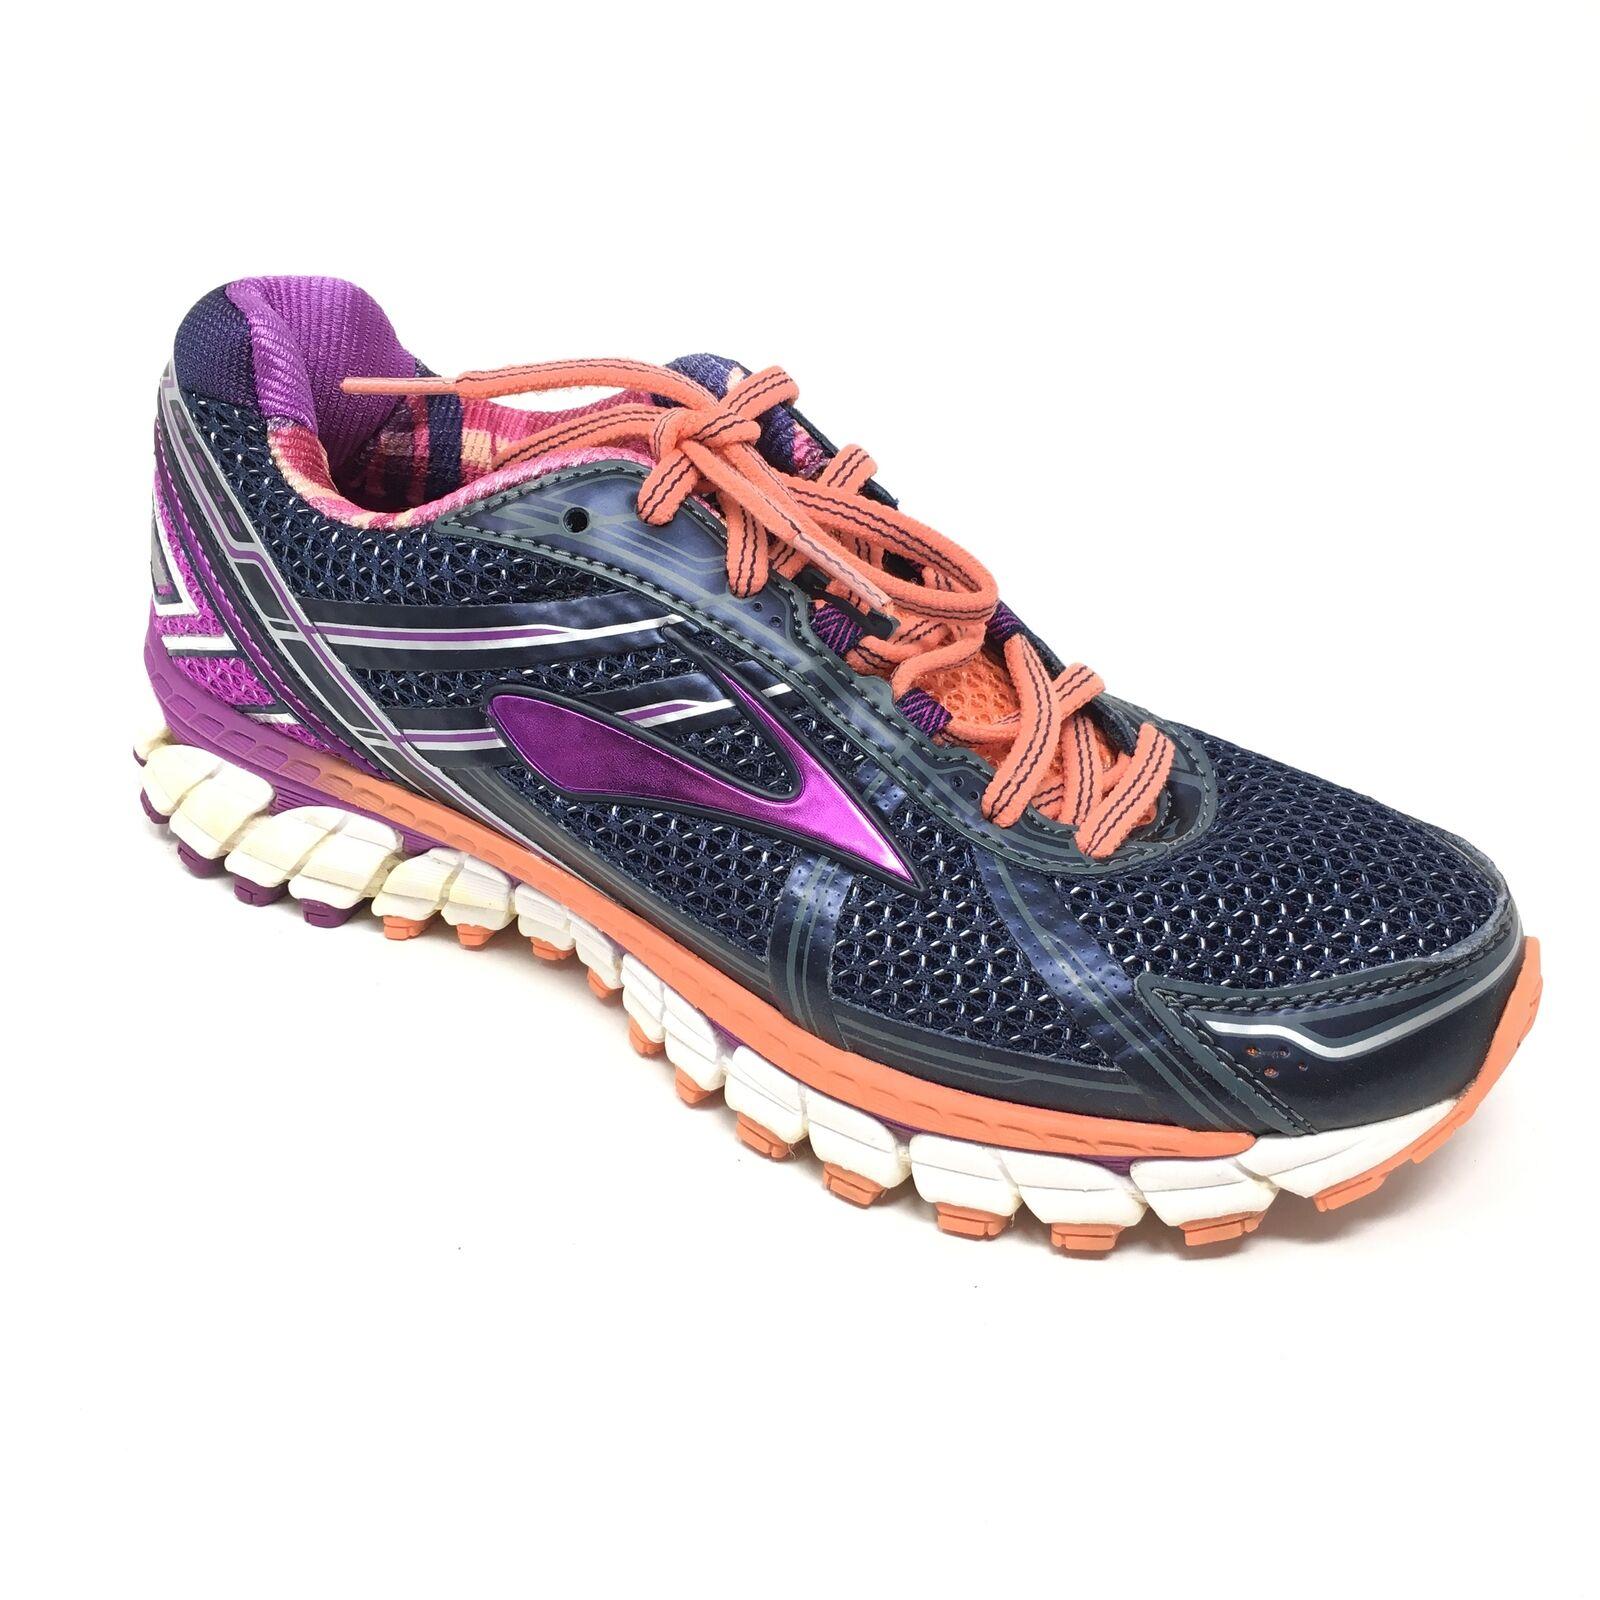 Women's Brooks GTS 15 shoes Sneakers Size 6.5B Running Indigo Purple orange X11